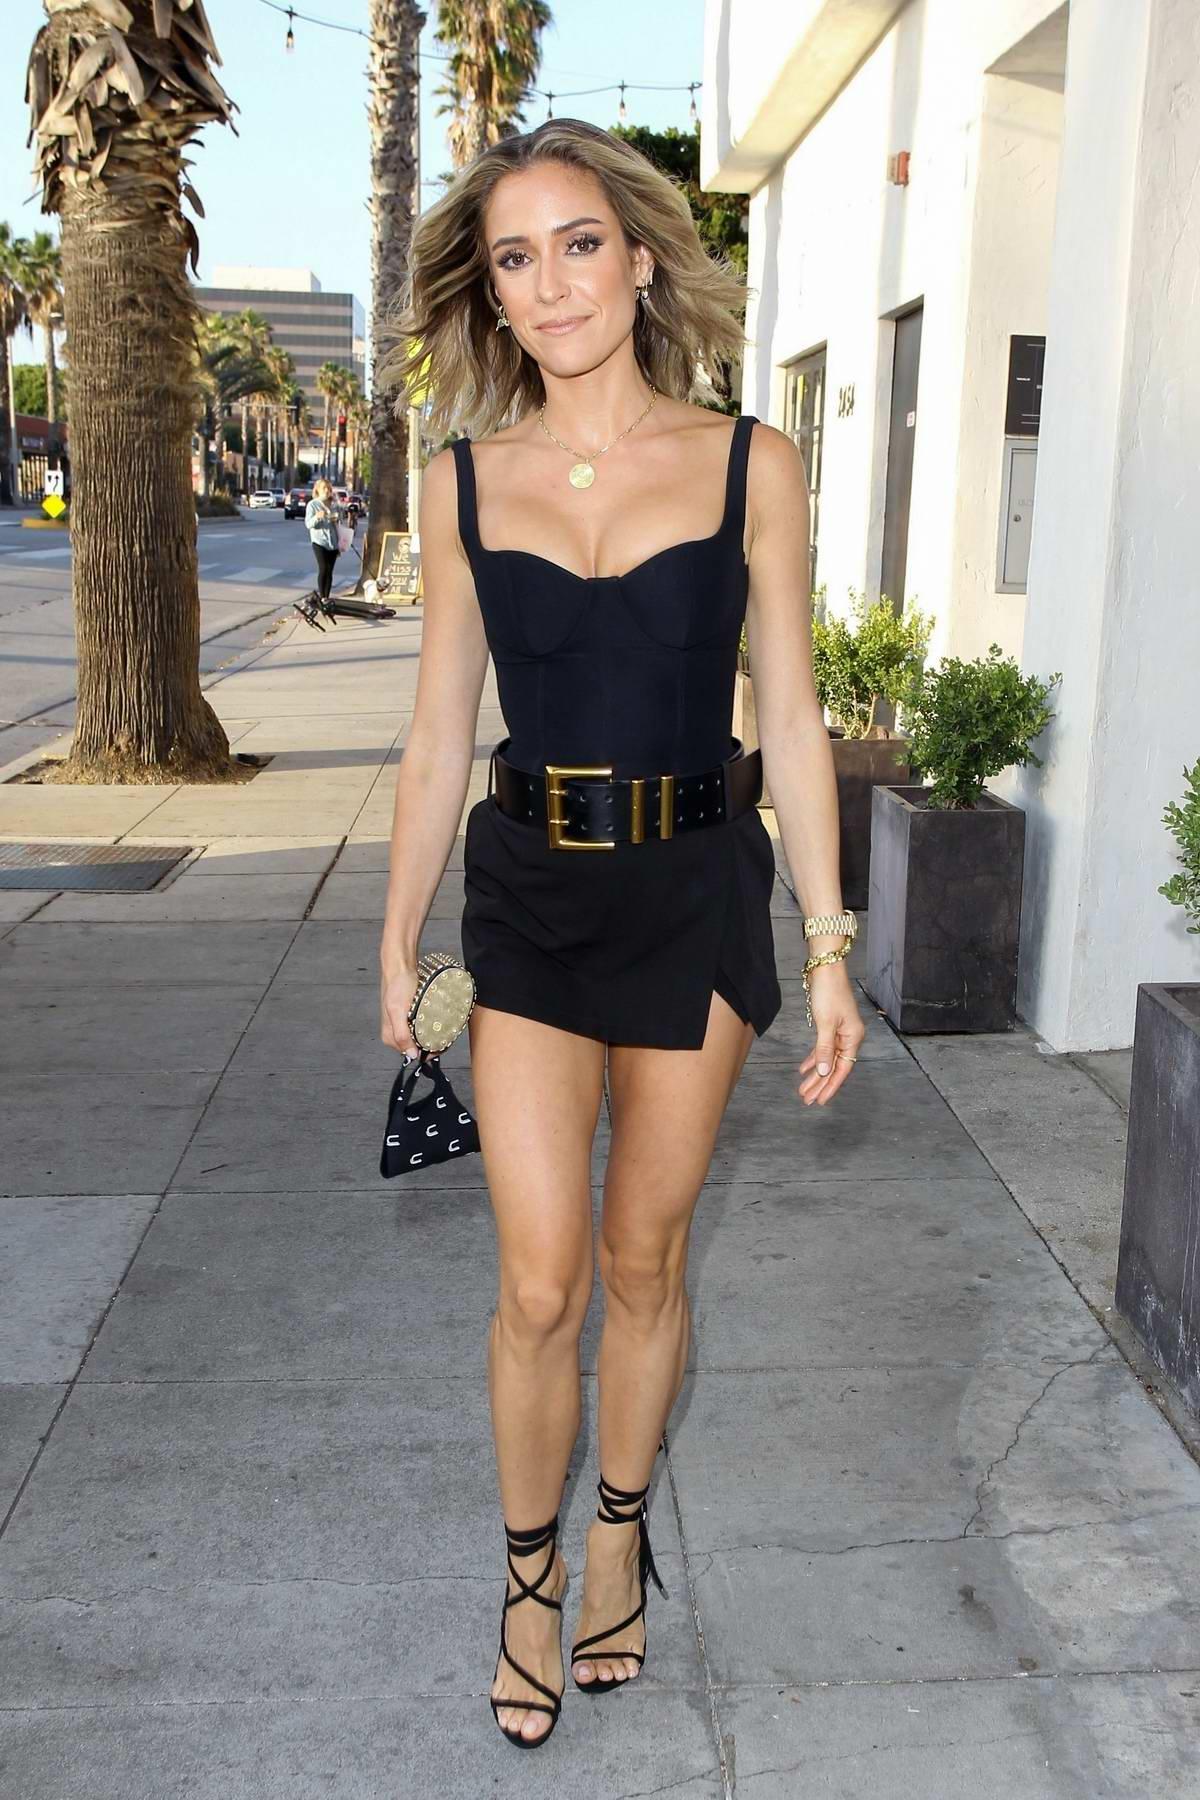 Kristin Cavallari looks stunning in a black mini dress while out for dinner at Fia in Santa Monica, California